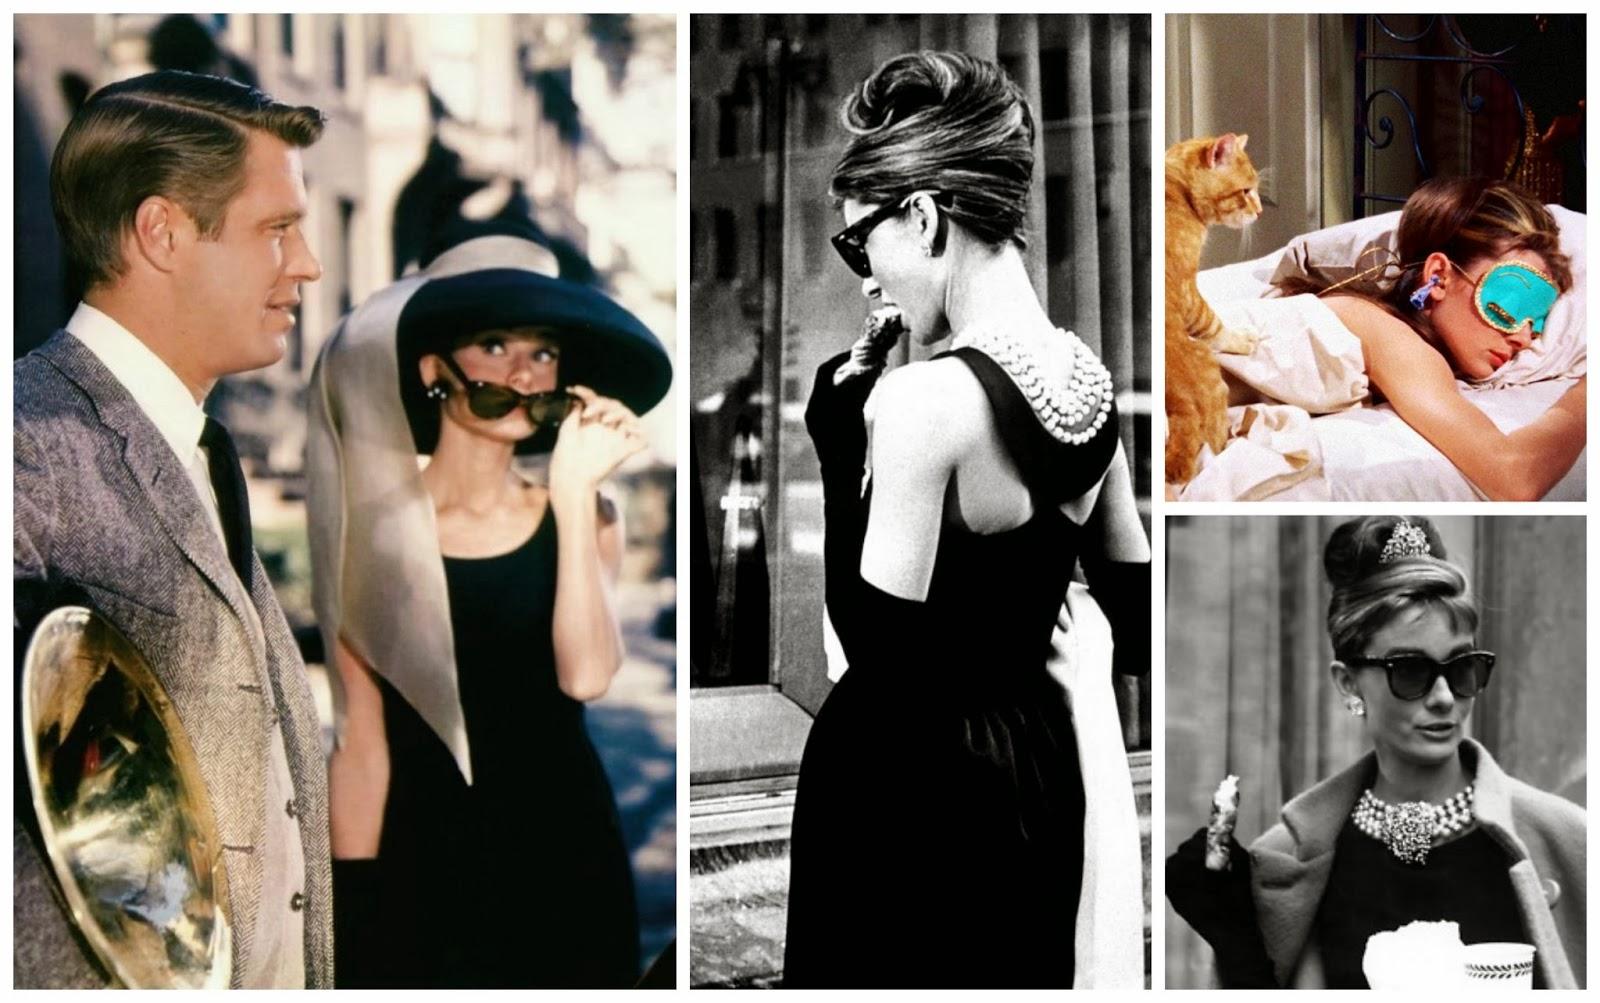 Audrey Hepburn 2 - Cia dos Gifs eddcd62272